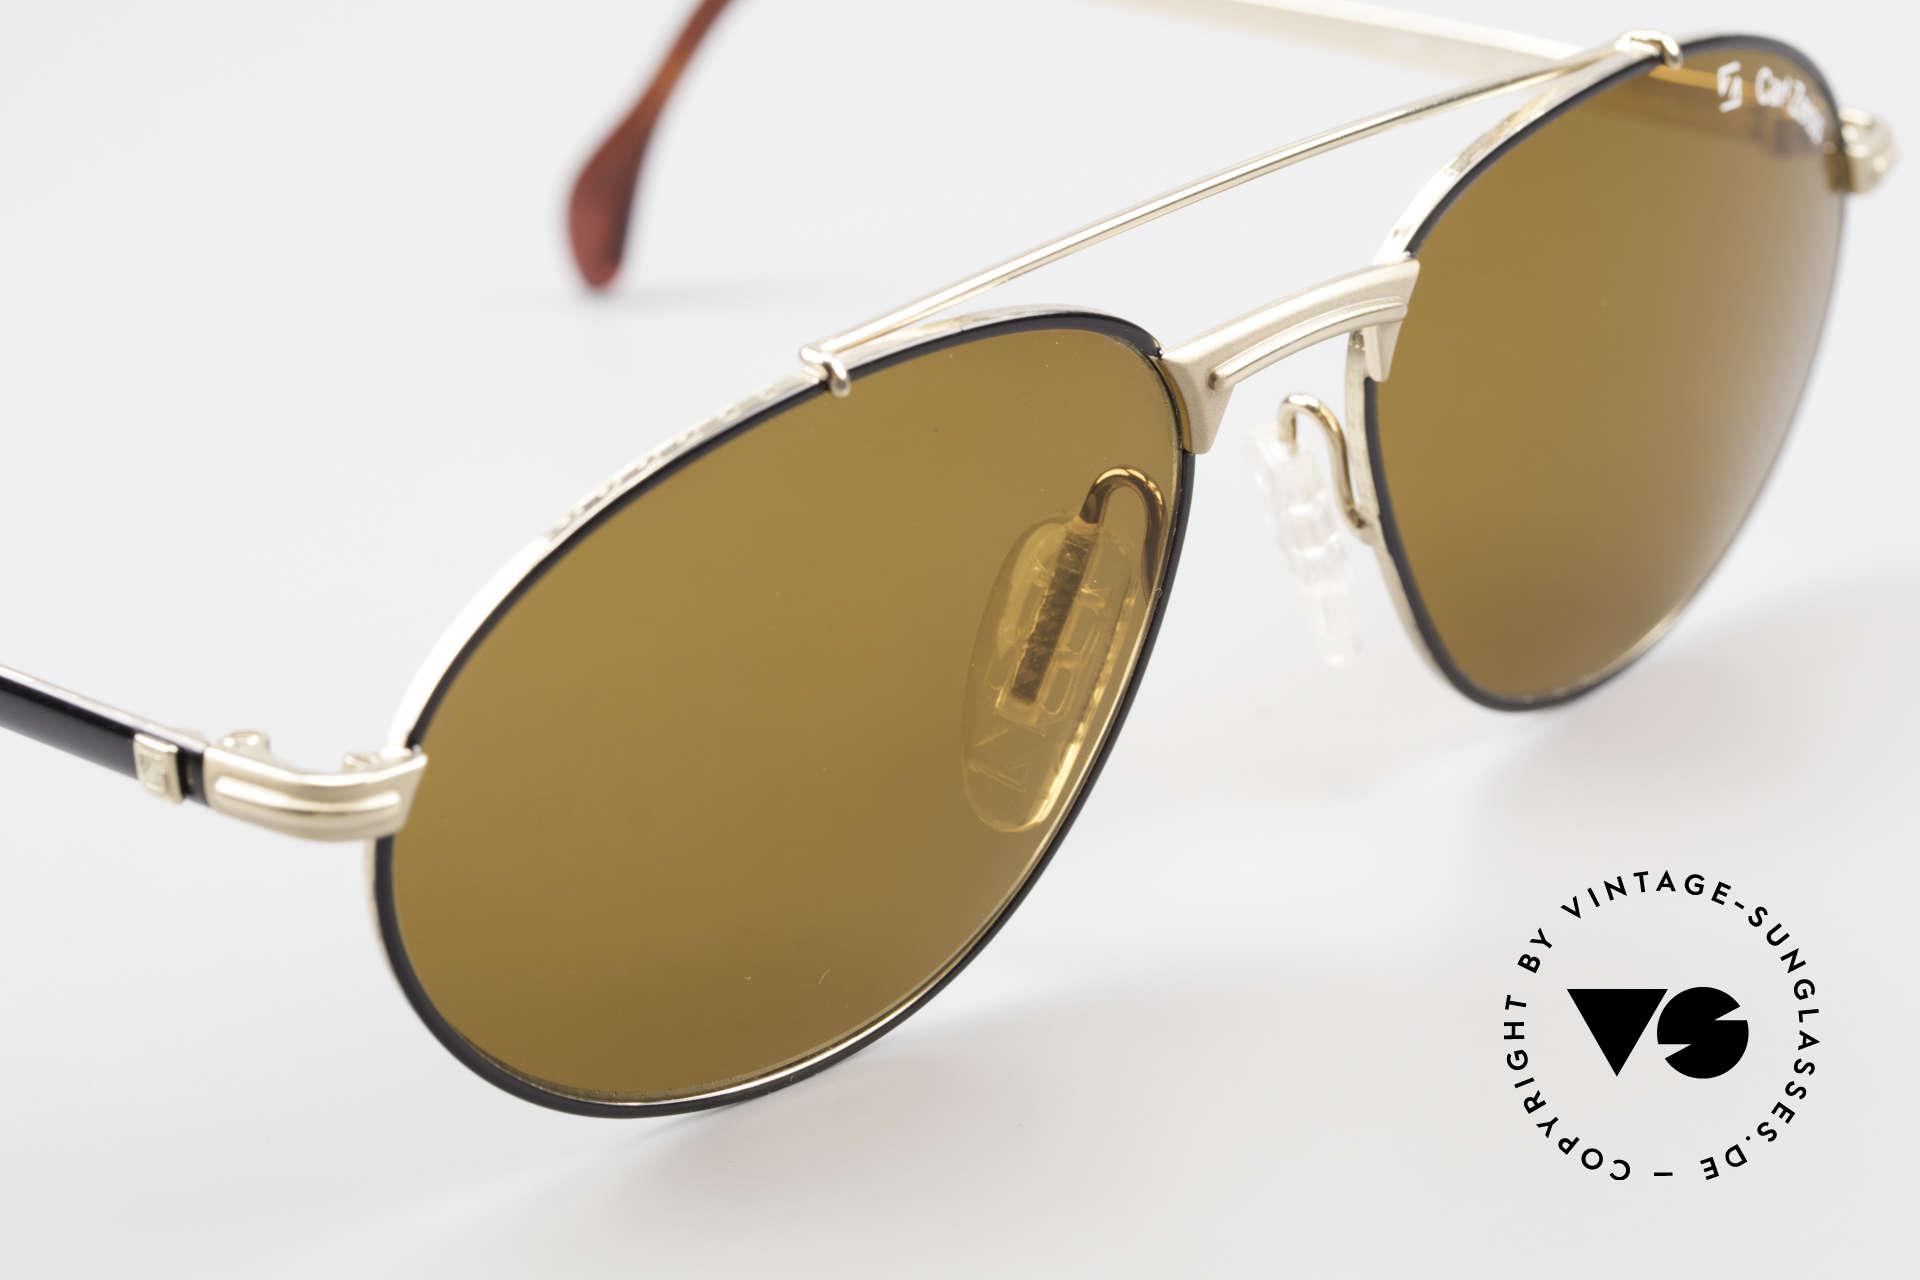 Zeiss 9401 Men's 90's Premium Glasses, a true alternative to the ordinary 'aviator design', Made for Men